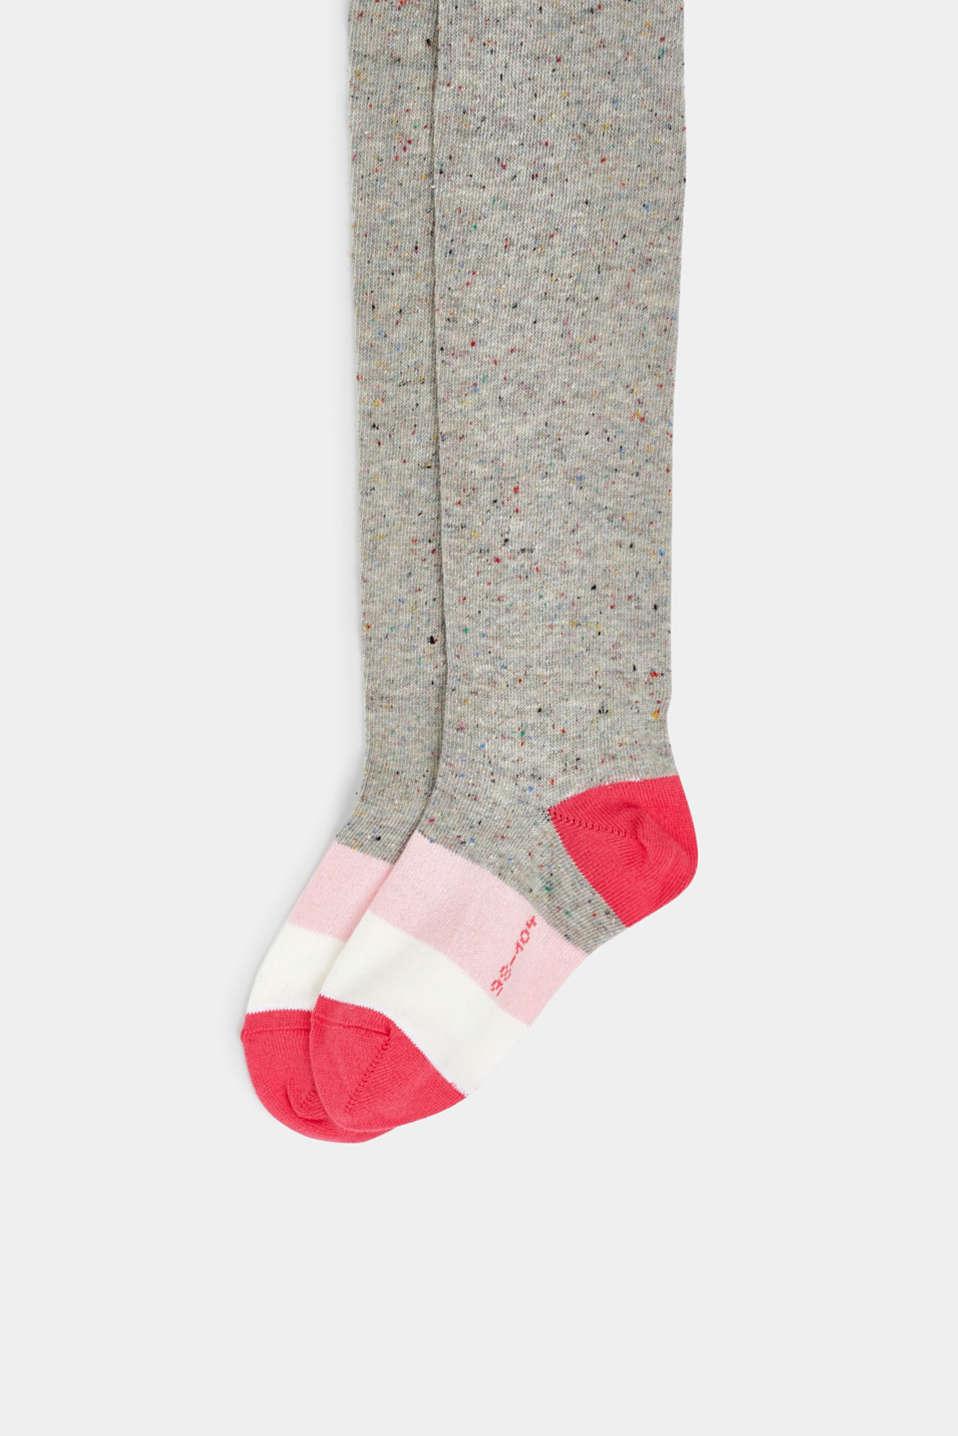 Knit blended cotton tights, LIGHT GREY, detail image number 1